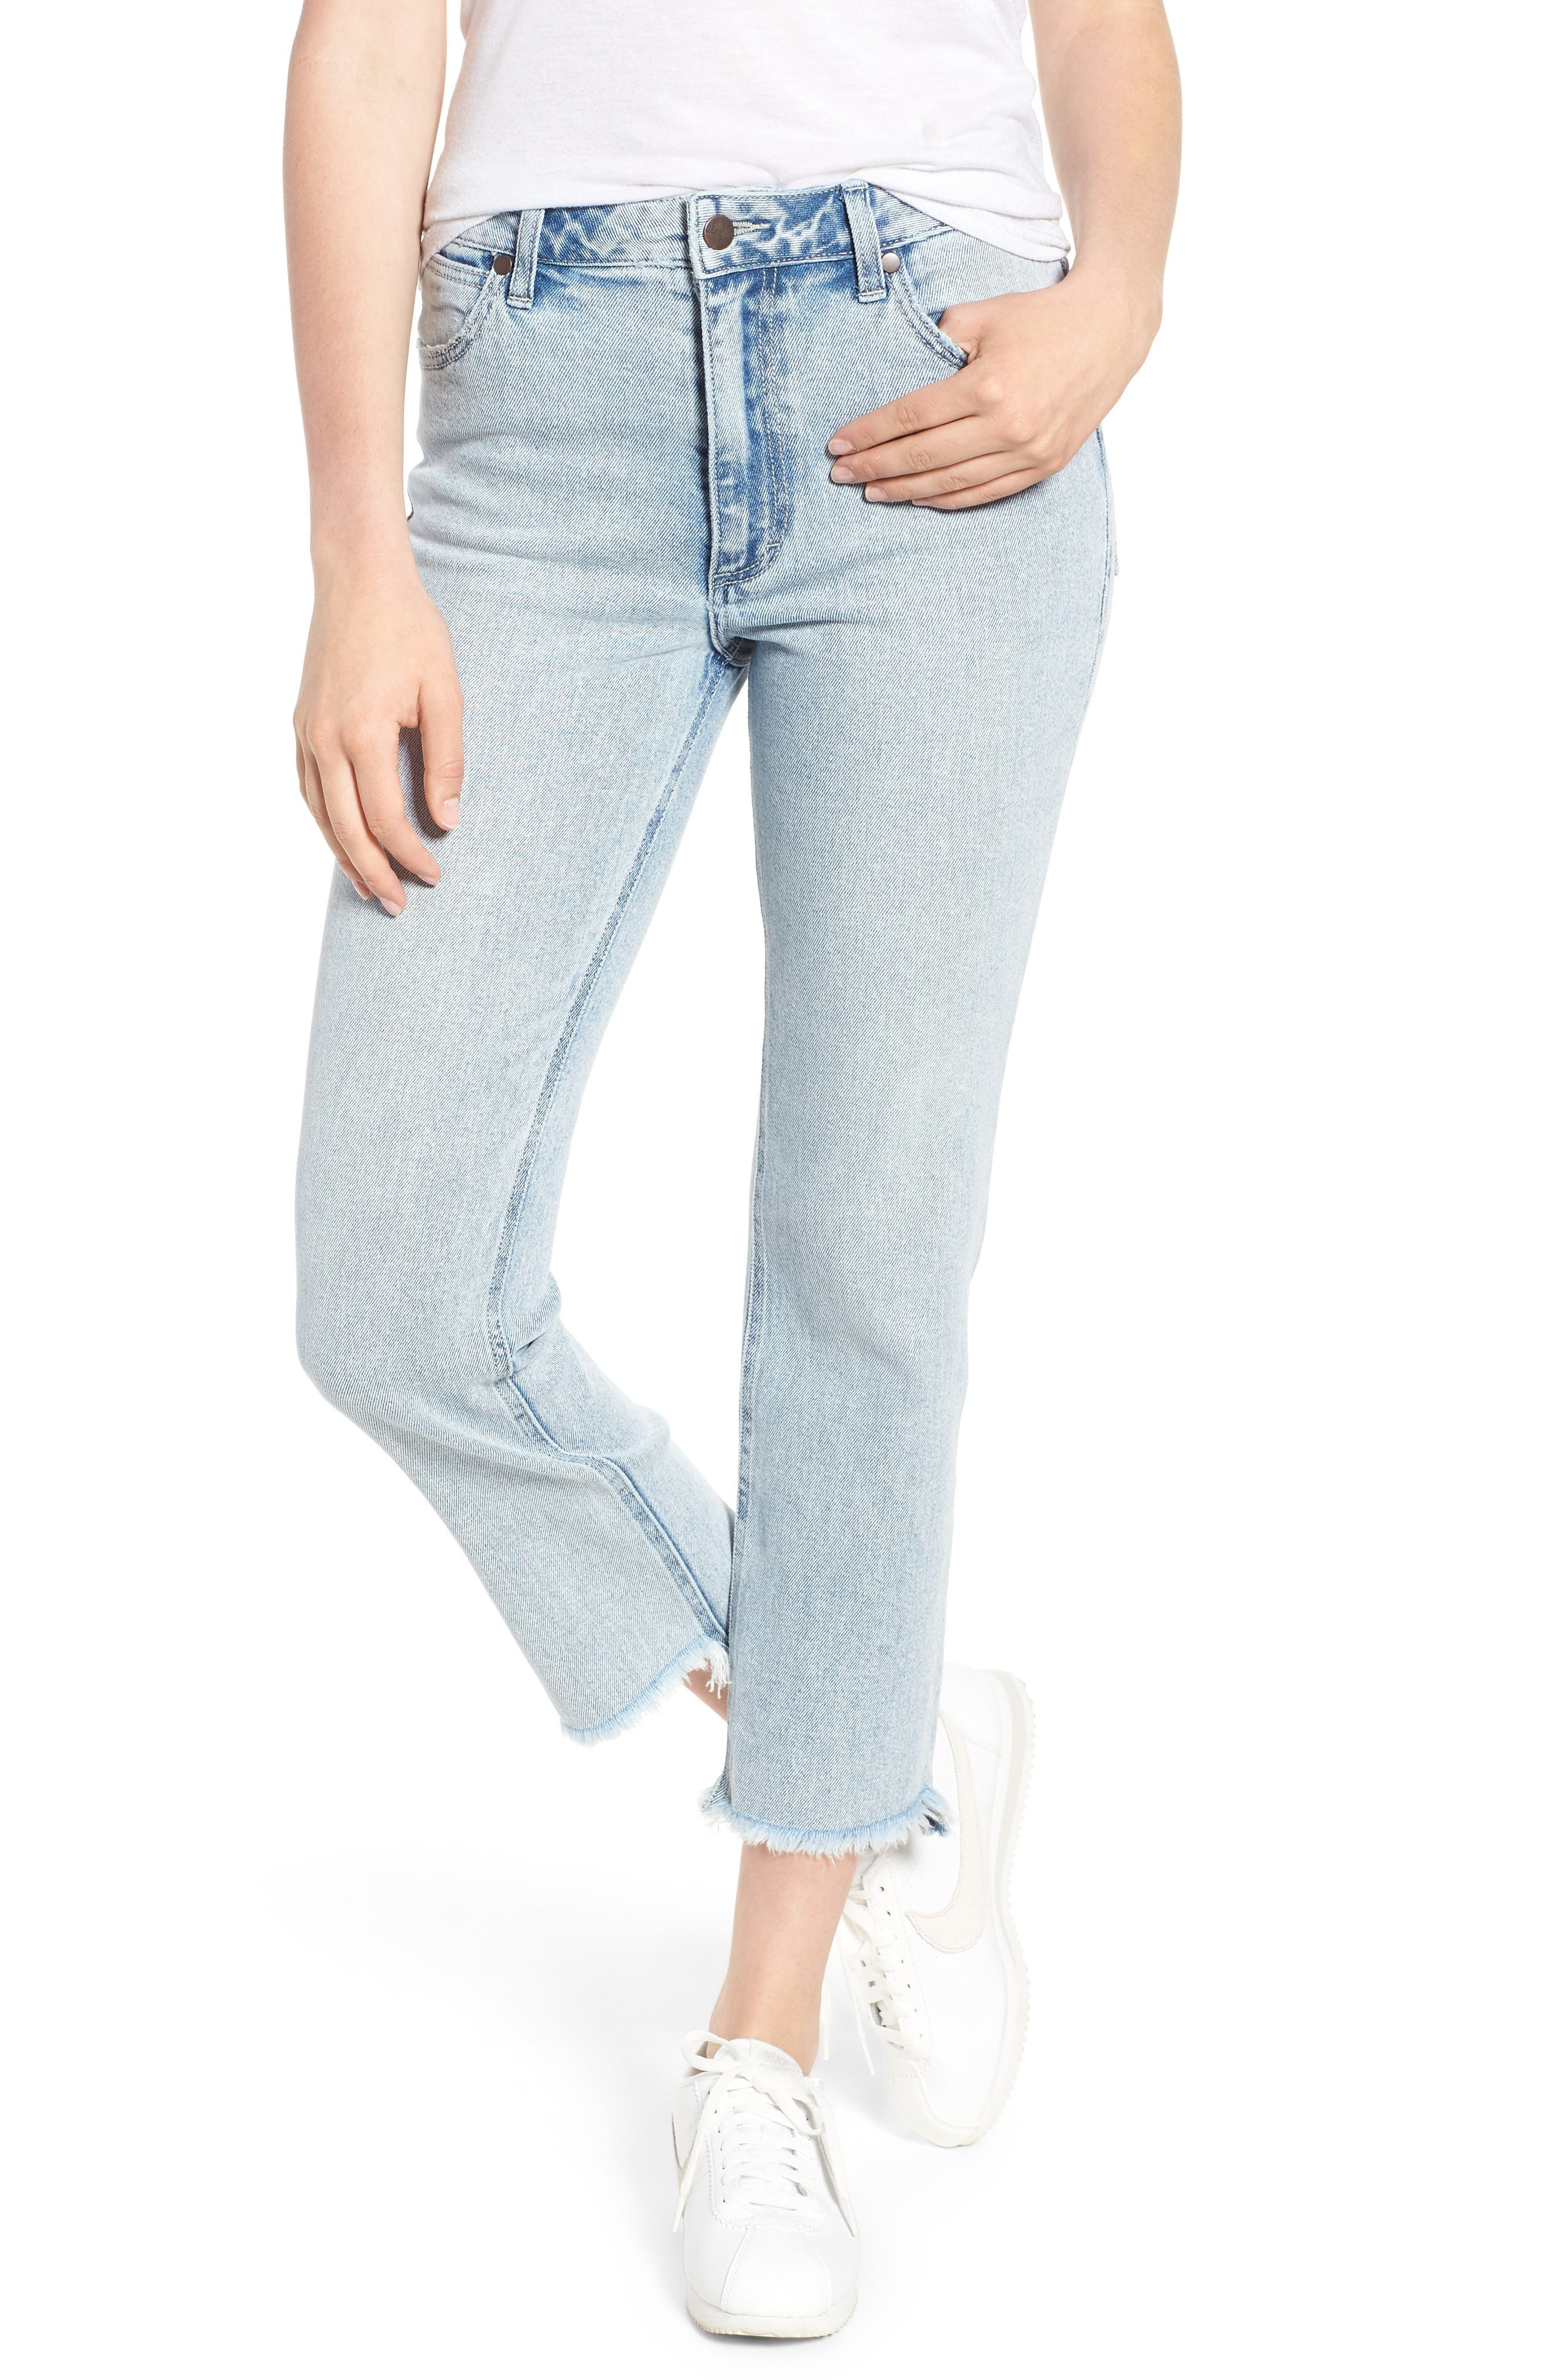 WRANGLER,                             Acid Wash High Waist Crop Jeans,                             Main thumbnail 1, color,                             454